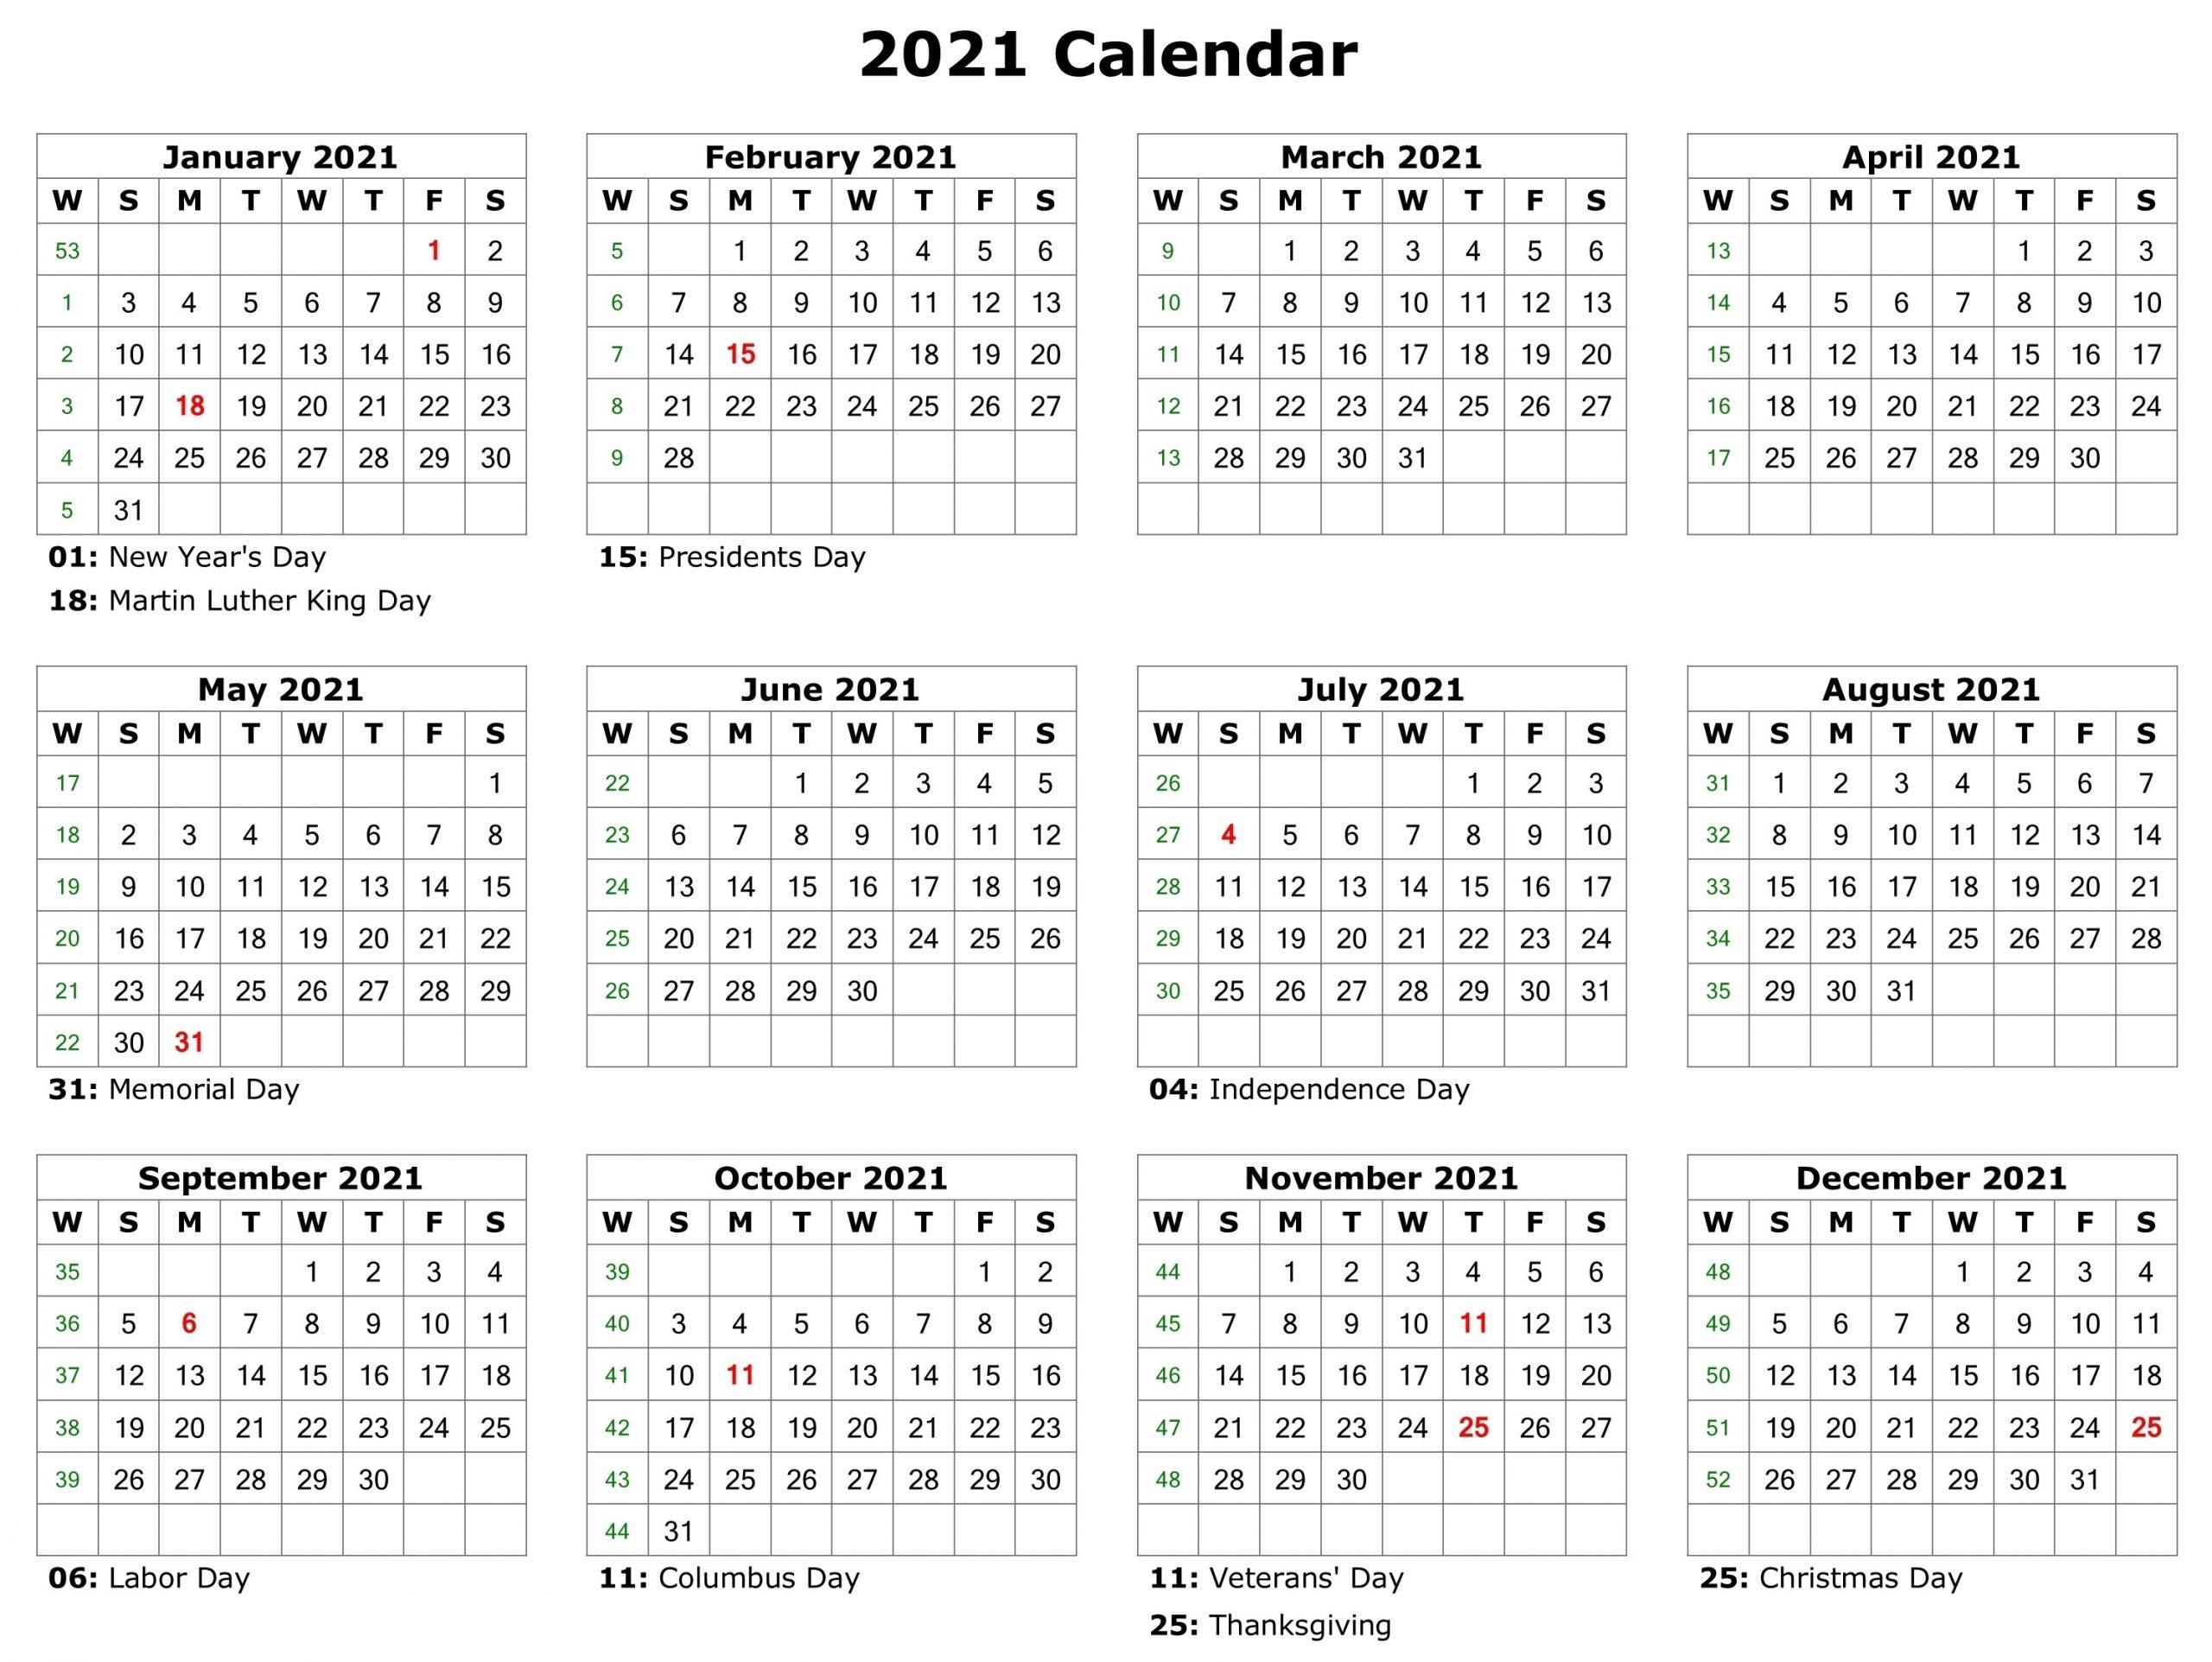 Free Printable 2021 Attendance Calendar | Calendar ...